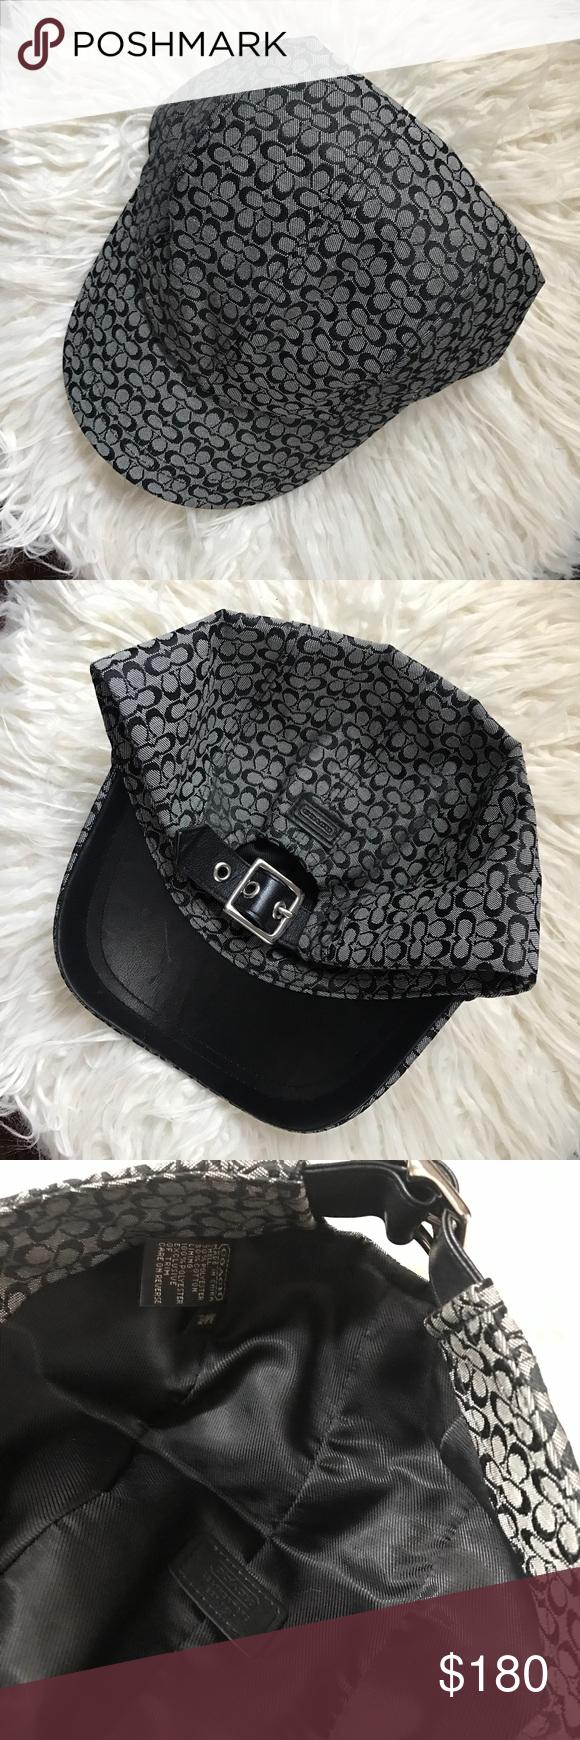 Coach Signature Baseball Cap Like new! Great condition! Coach Accessories  Hats 57e48b769f0